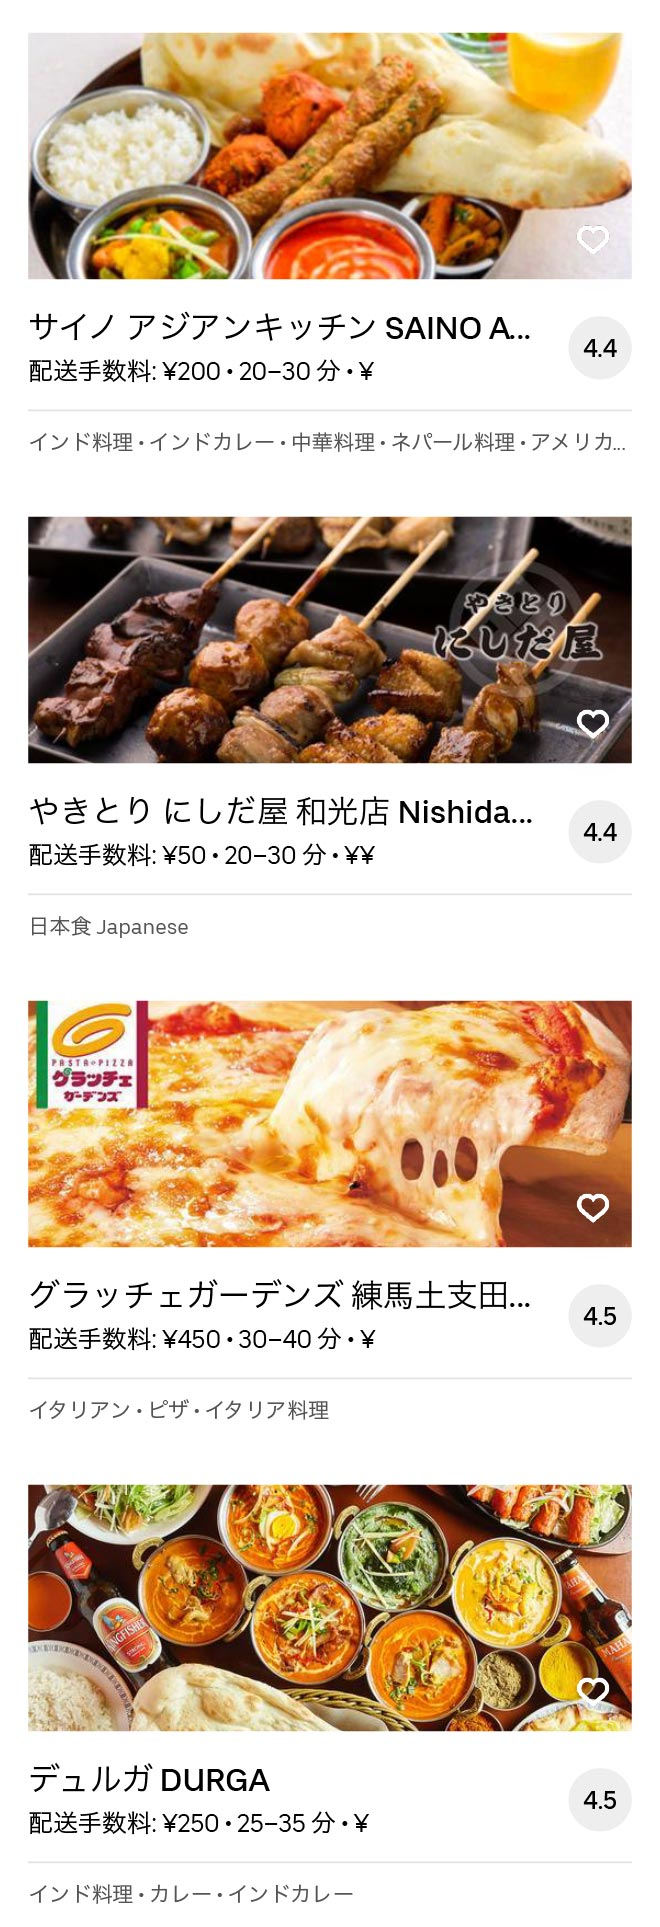 Saitama wako menu 2004 11